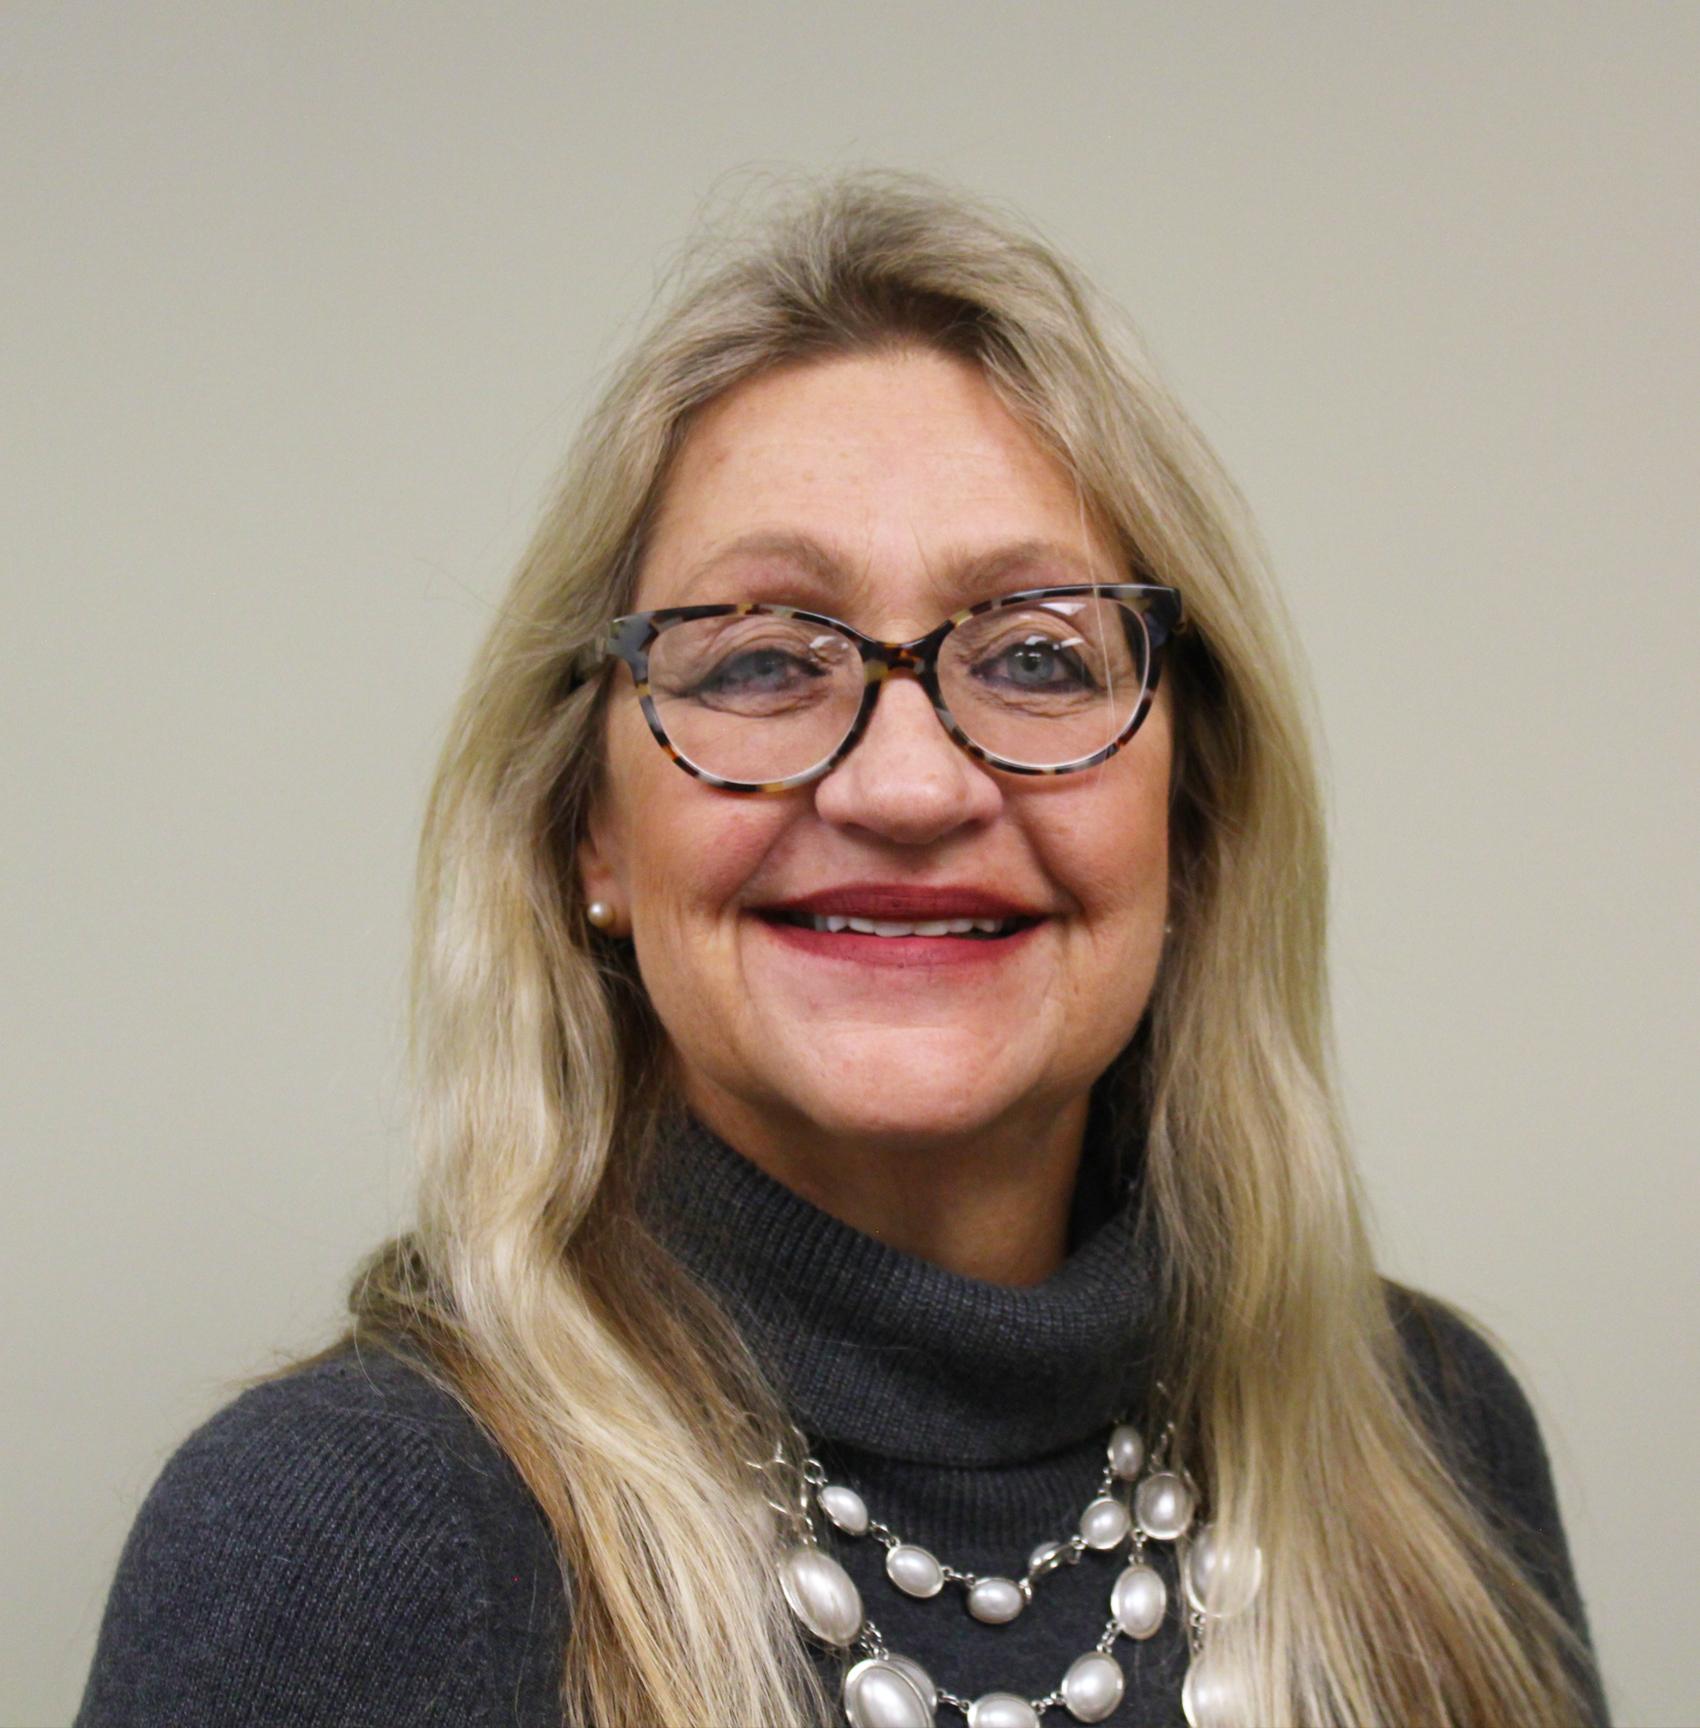 Cindy Finohr